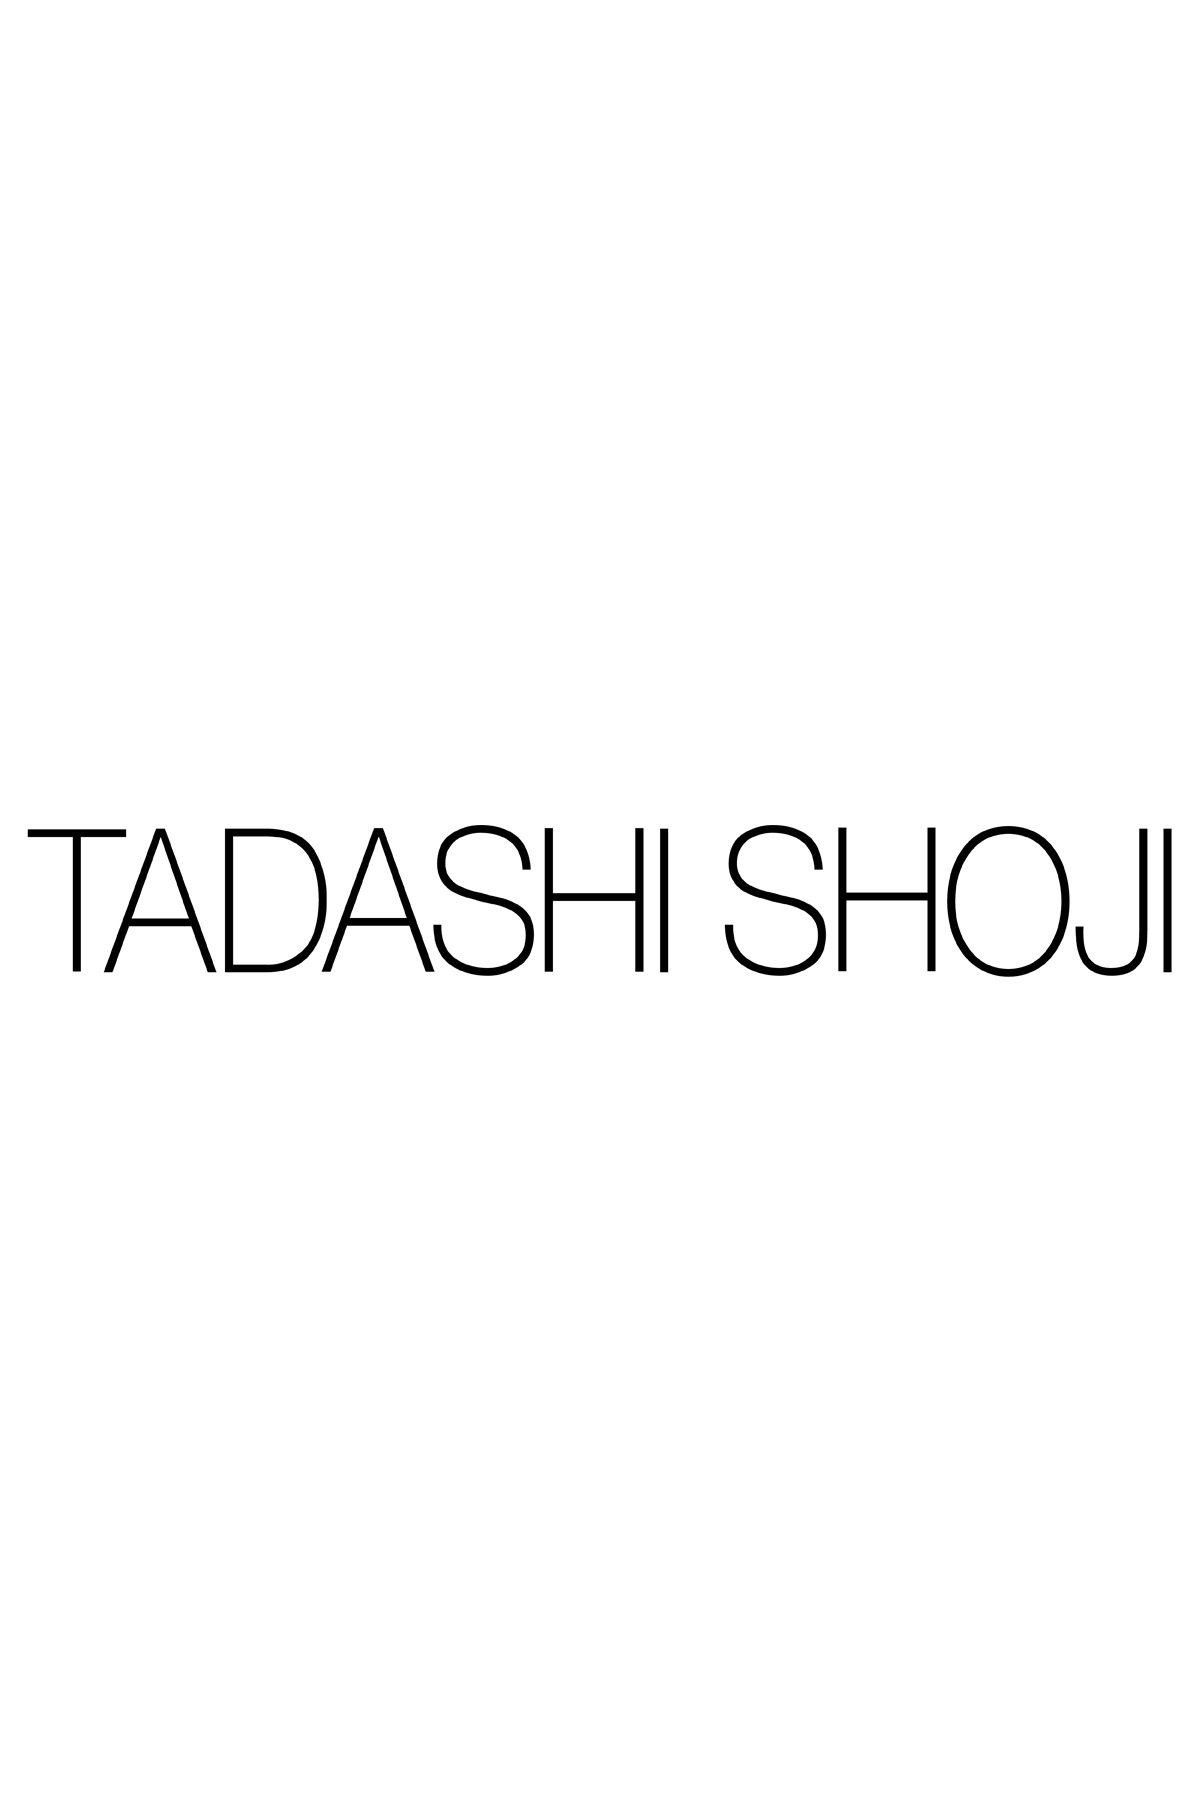 cbf795455b1 ... Tadashi Shoji - Whitson Off-The-Shoulder Sequin Gown - PLUS SIZE